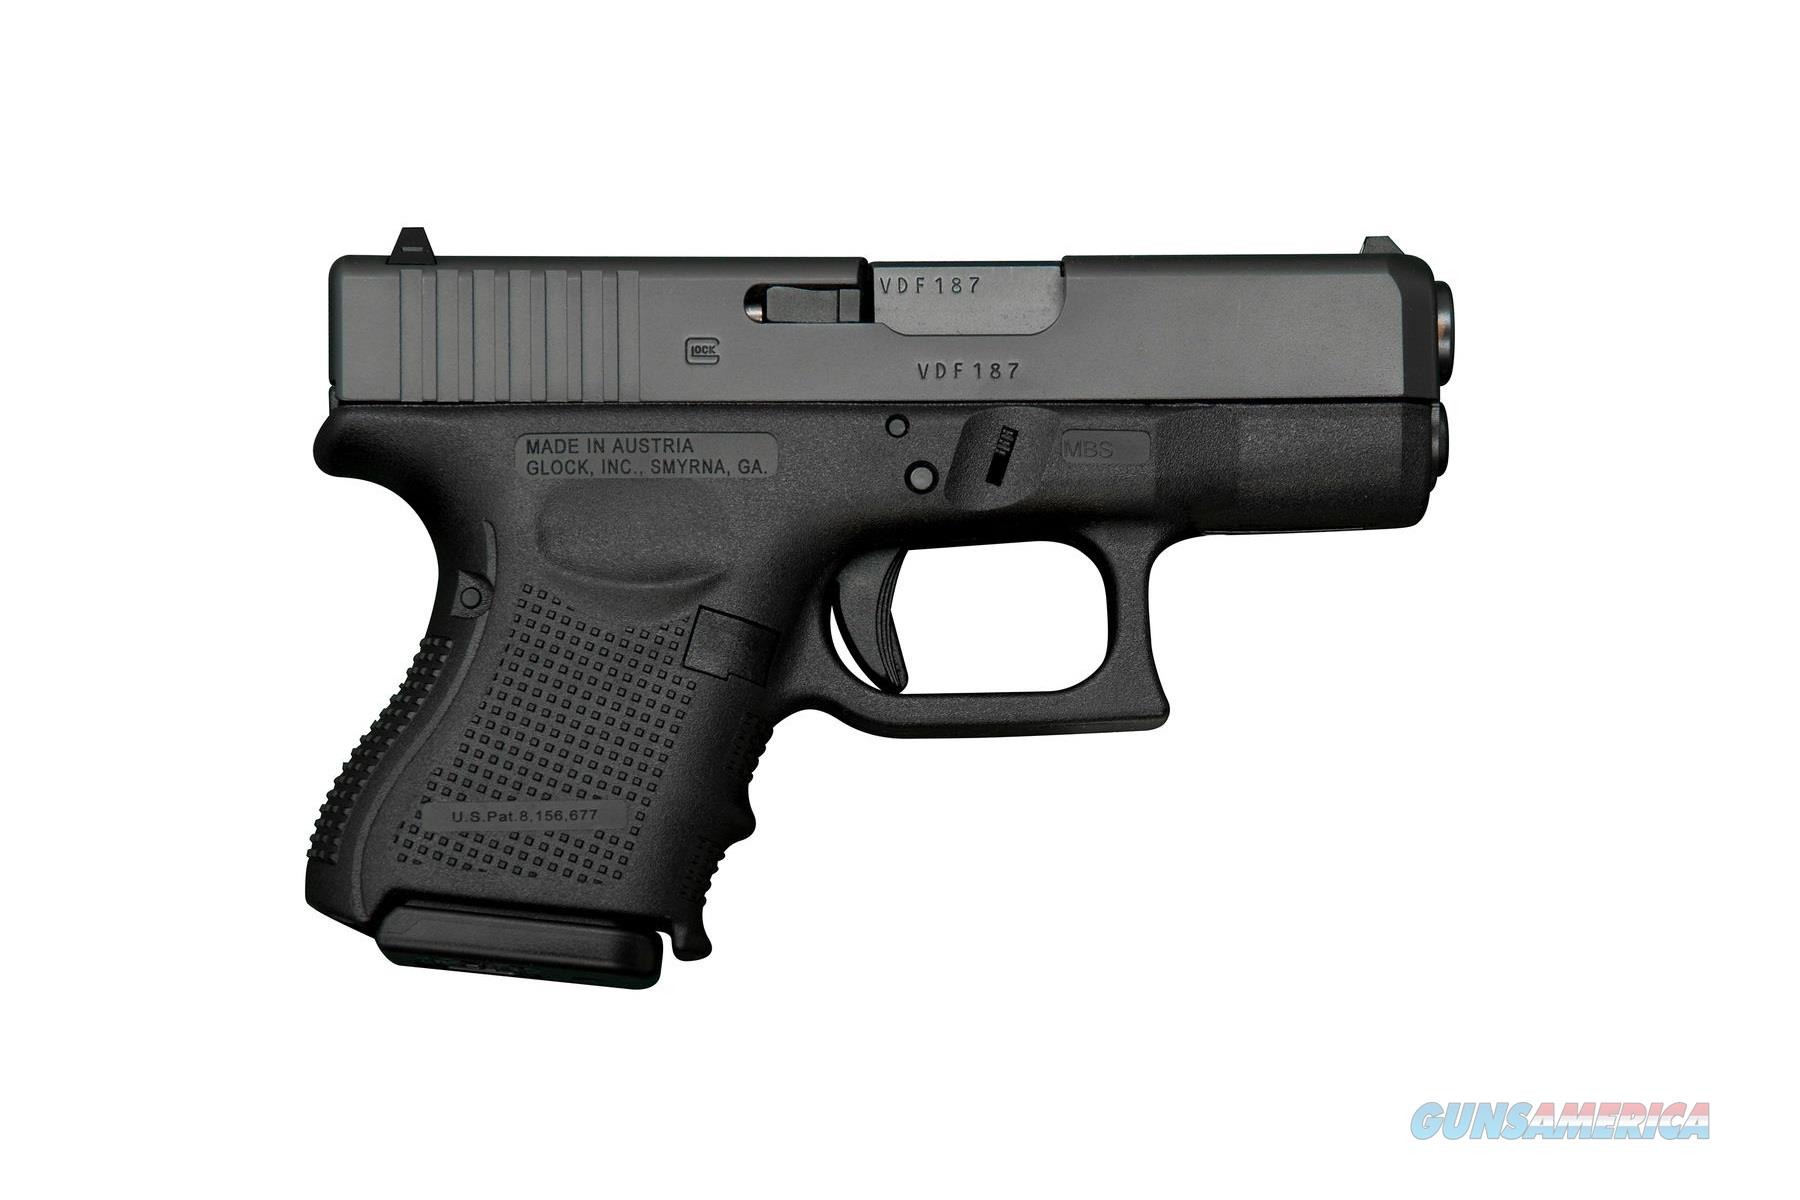 Glock 27 G27 GEN 4 SUB-COMPACT .40 S&W PG2750201  Guns > Pistols > Glock Pistols > 26/27